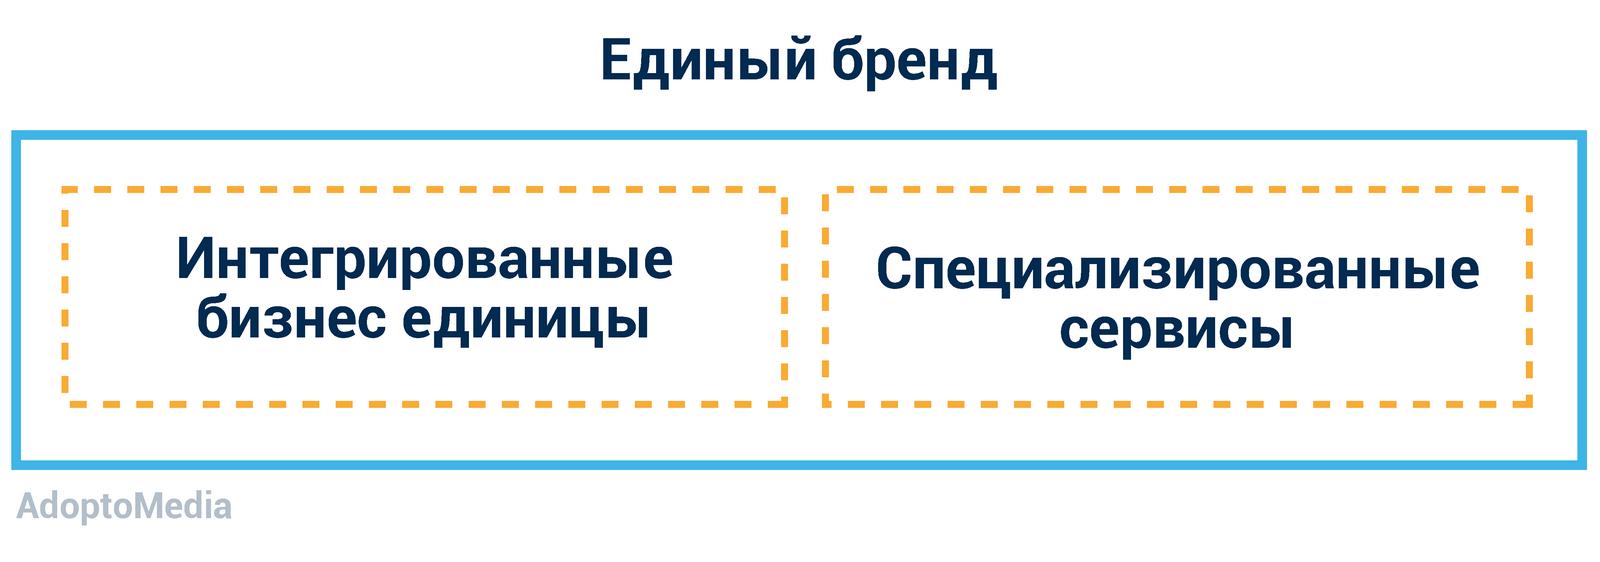 маркетинговое агентство, эффективное маркетинговое агентство, интеграция маркетинговых агентств, проблемы маркетингового агентства